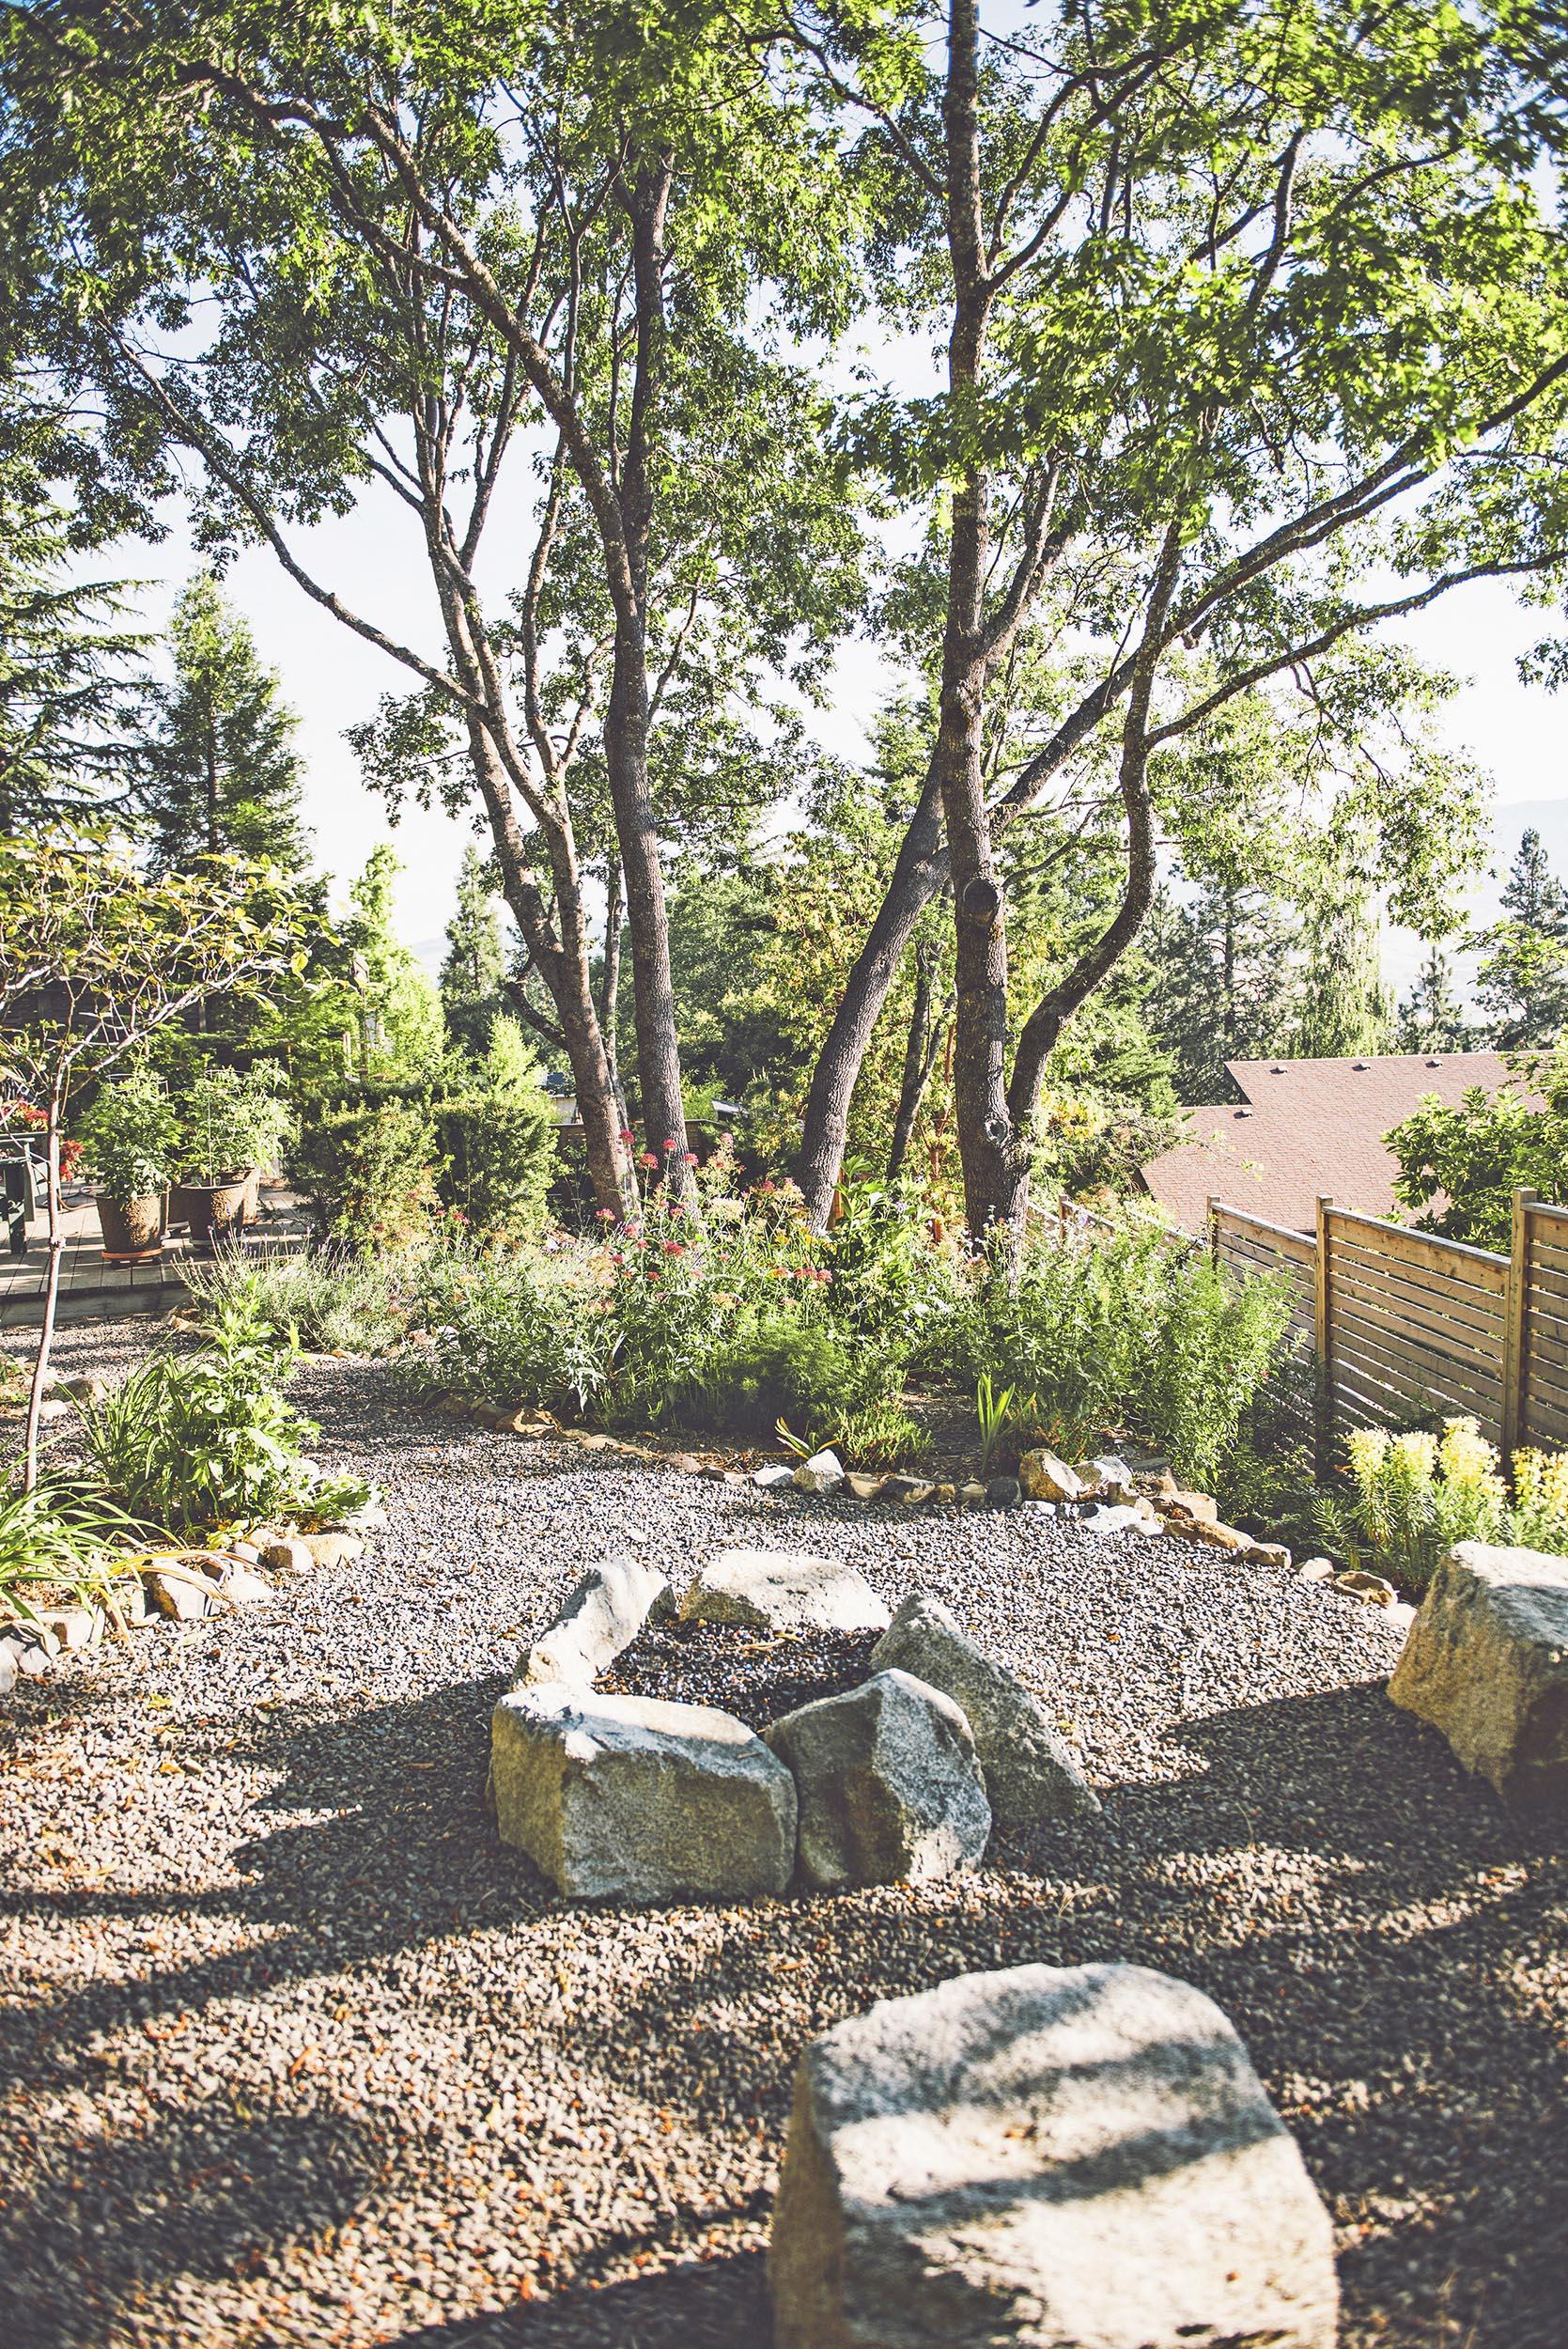 granite boulder fire pit + crushed basalt gravel paths + locally quarried rock + colorful perennial flower garden + oak canopy + modern slatted priva